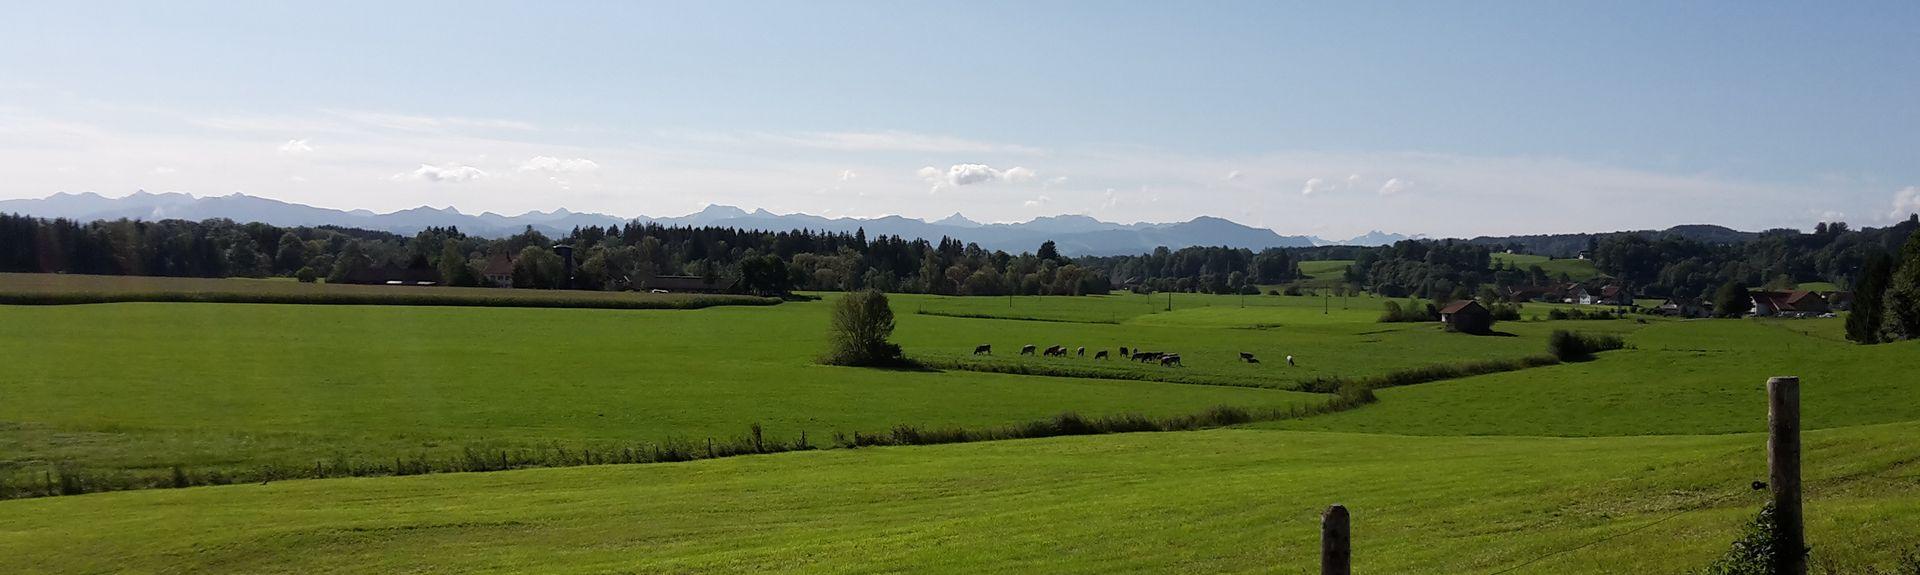 Altusried, Baviera, Alemania